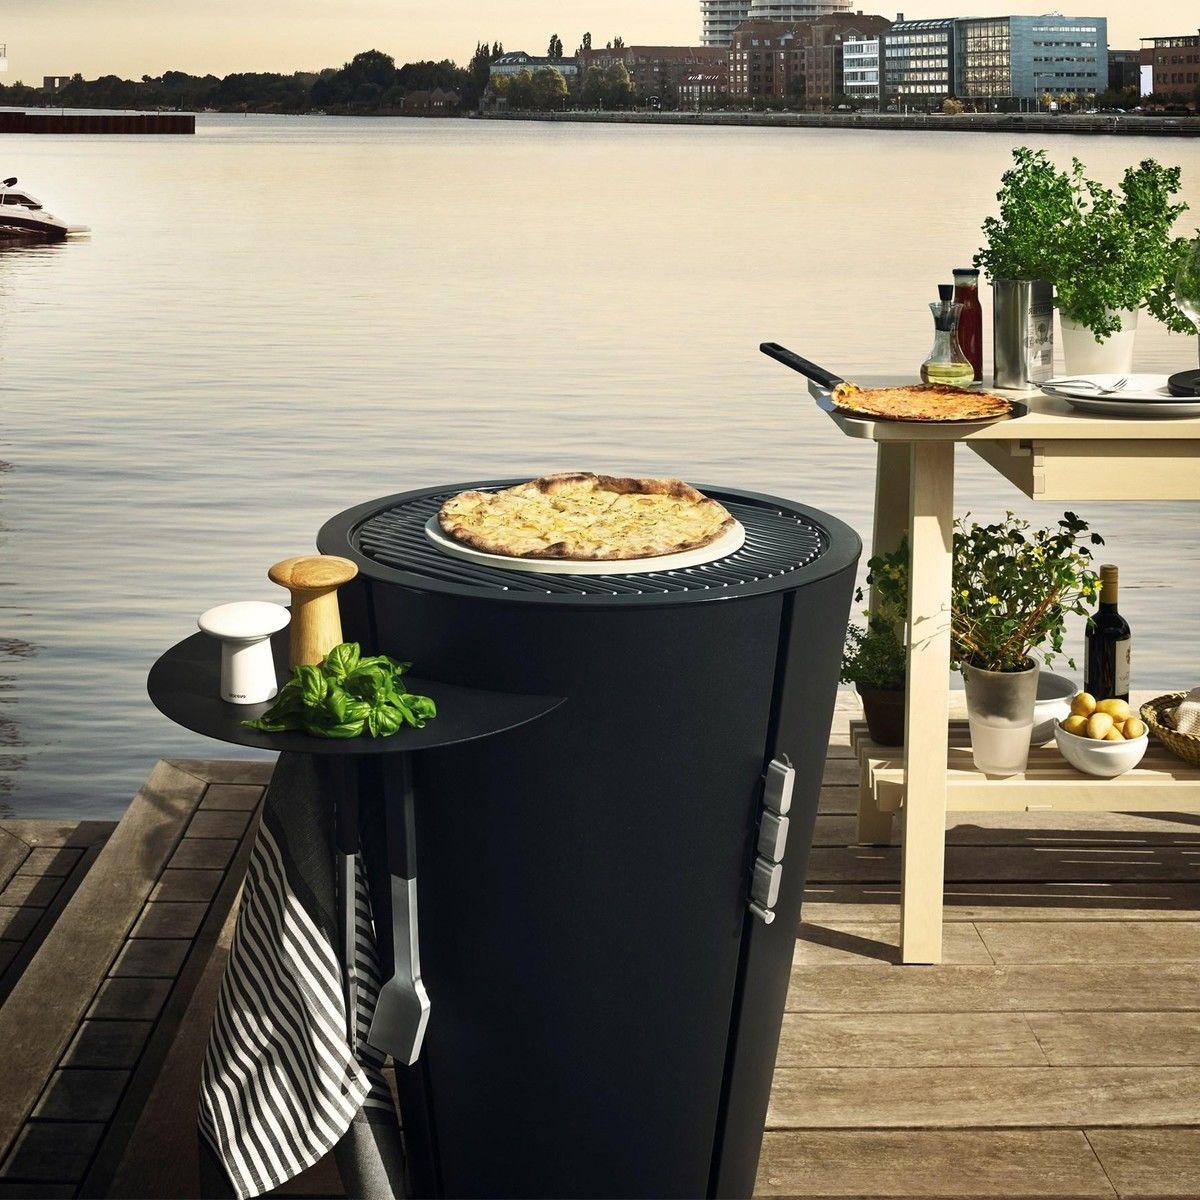 eva solo accessoires pour barbecue eva solo barbecues accessoires outdoor. Black Bedroom Furniture Sets. Home Design Ideas